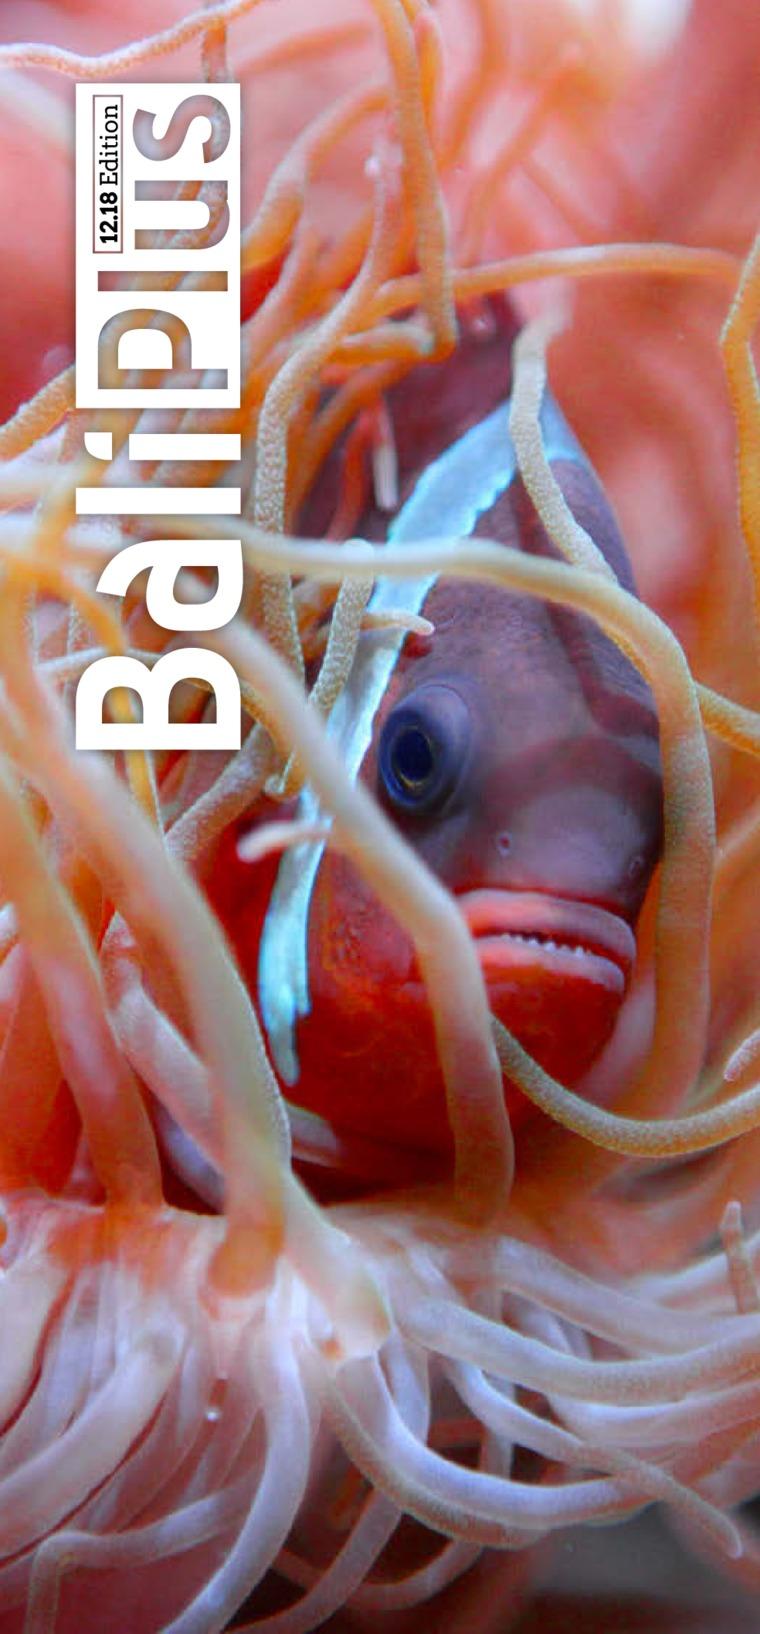 BALI PLUS Digital Magazine January 2019